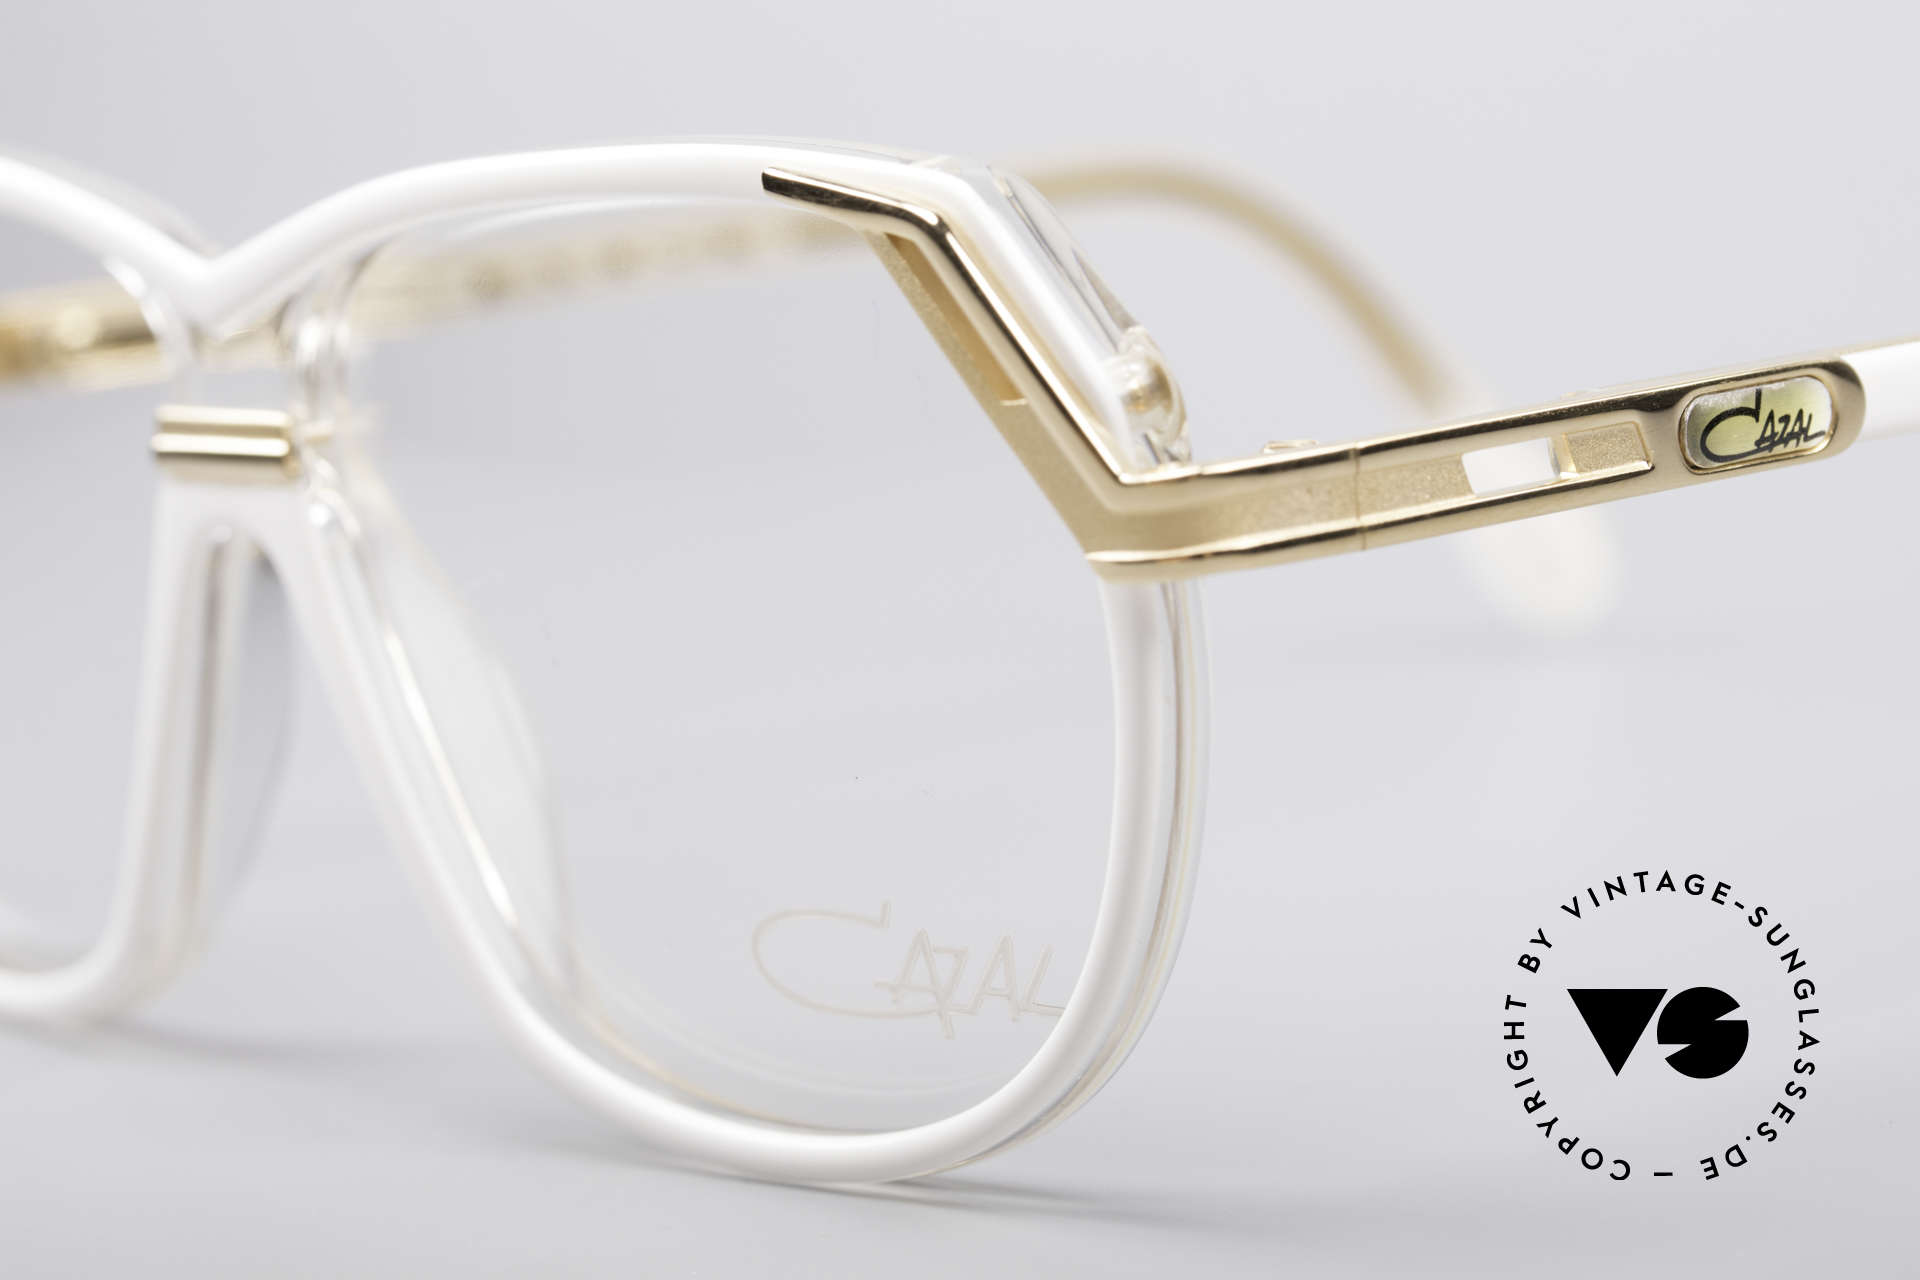 Cazal 339 90's Vintage Designer Specs, unworn, NOS (like all our vintage 90s Cazal), Made for Women